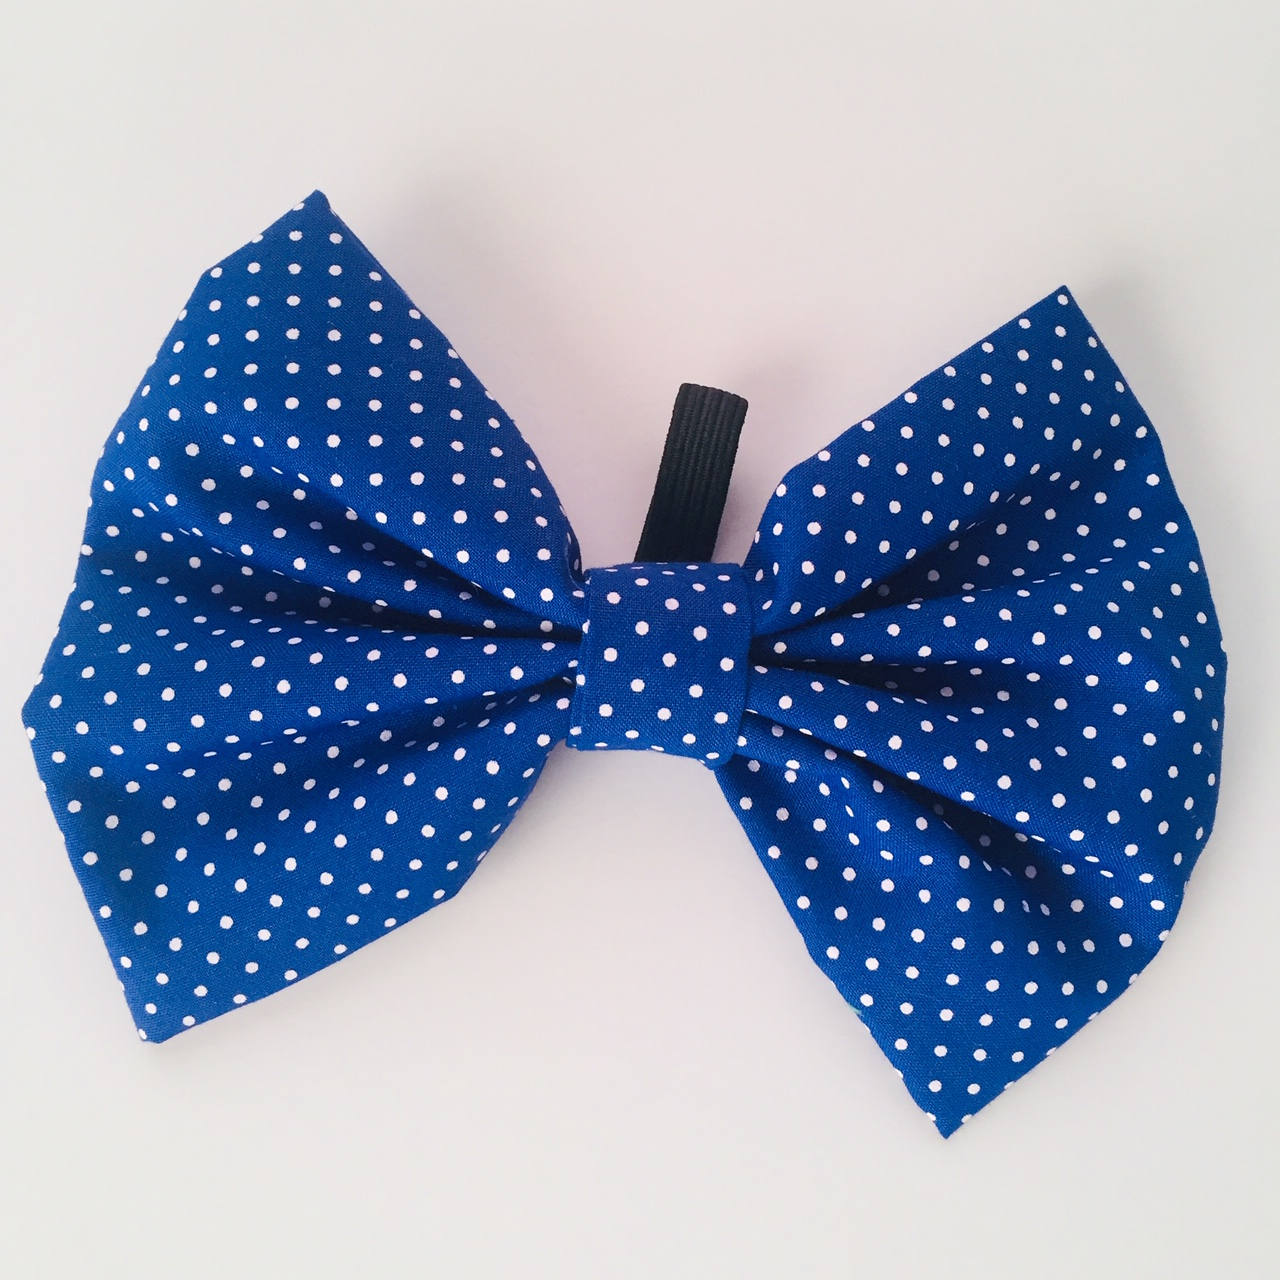 Corbatin Azul puntos blancos